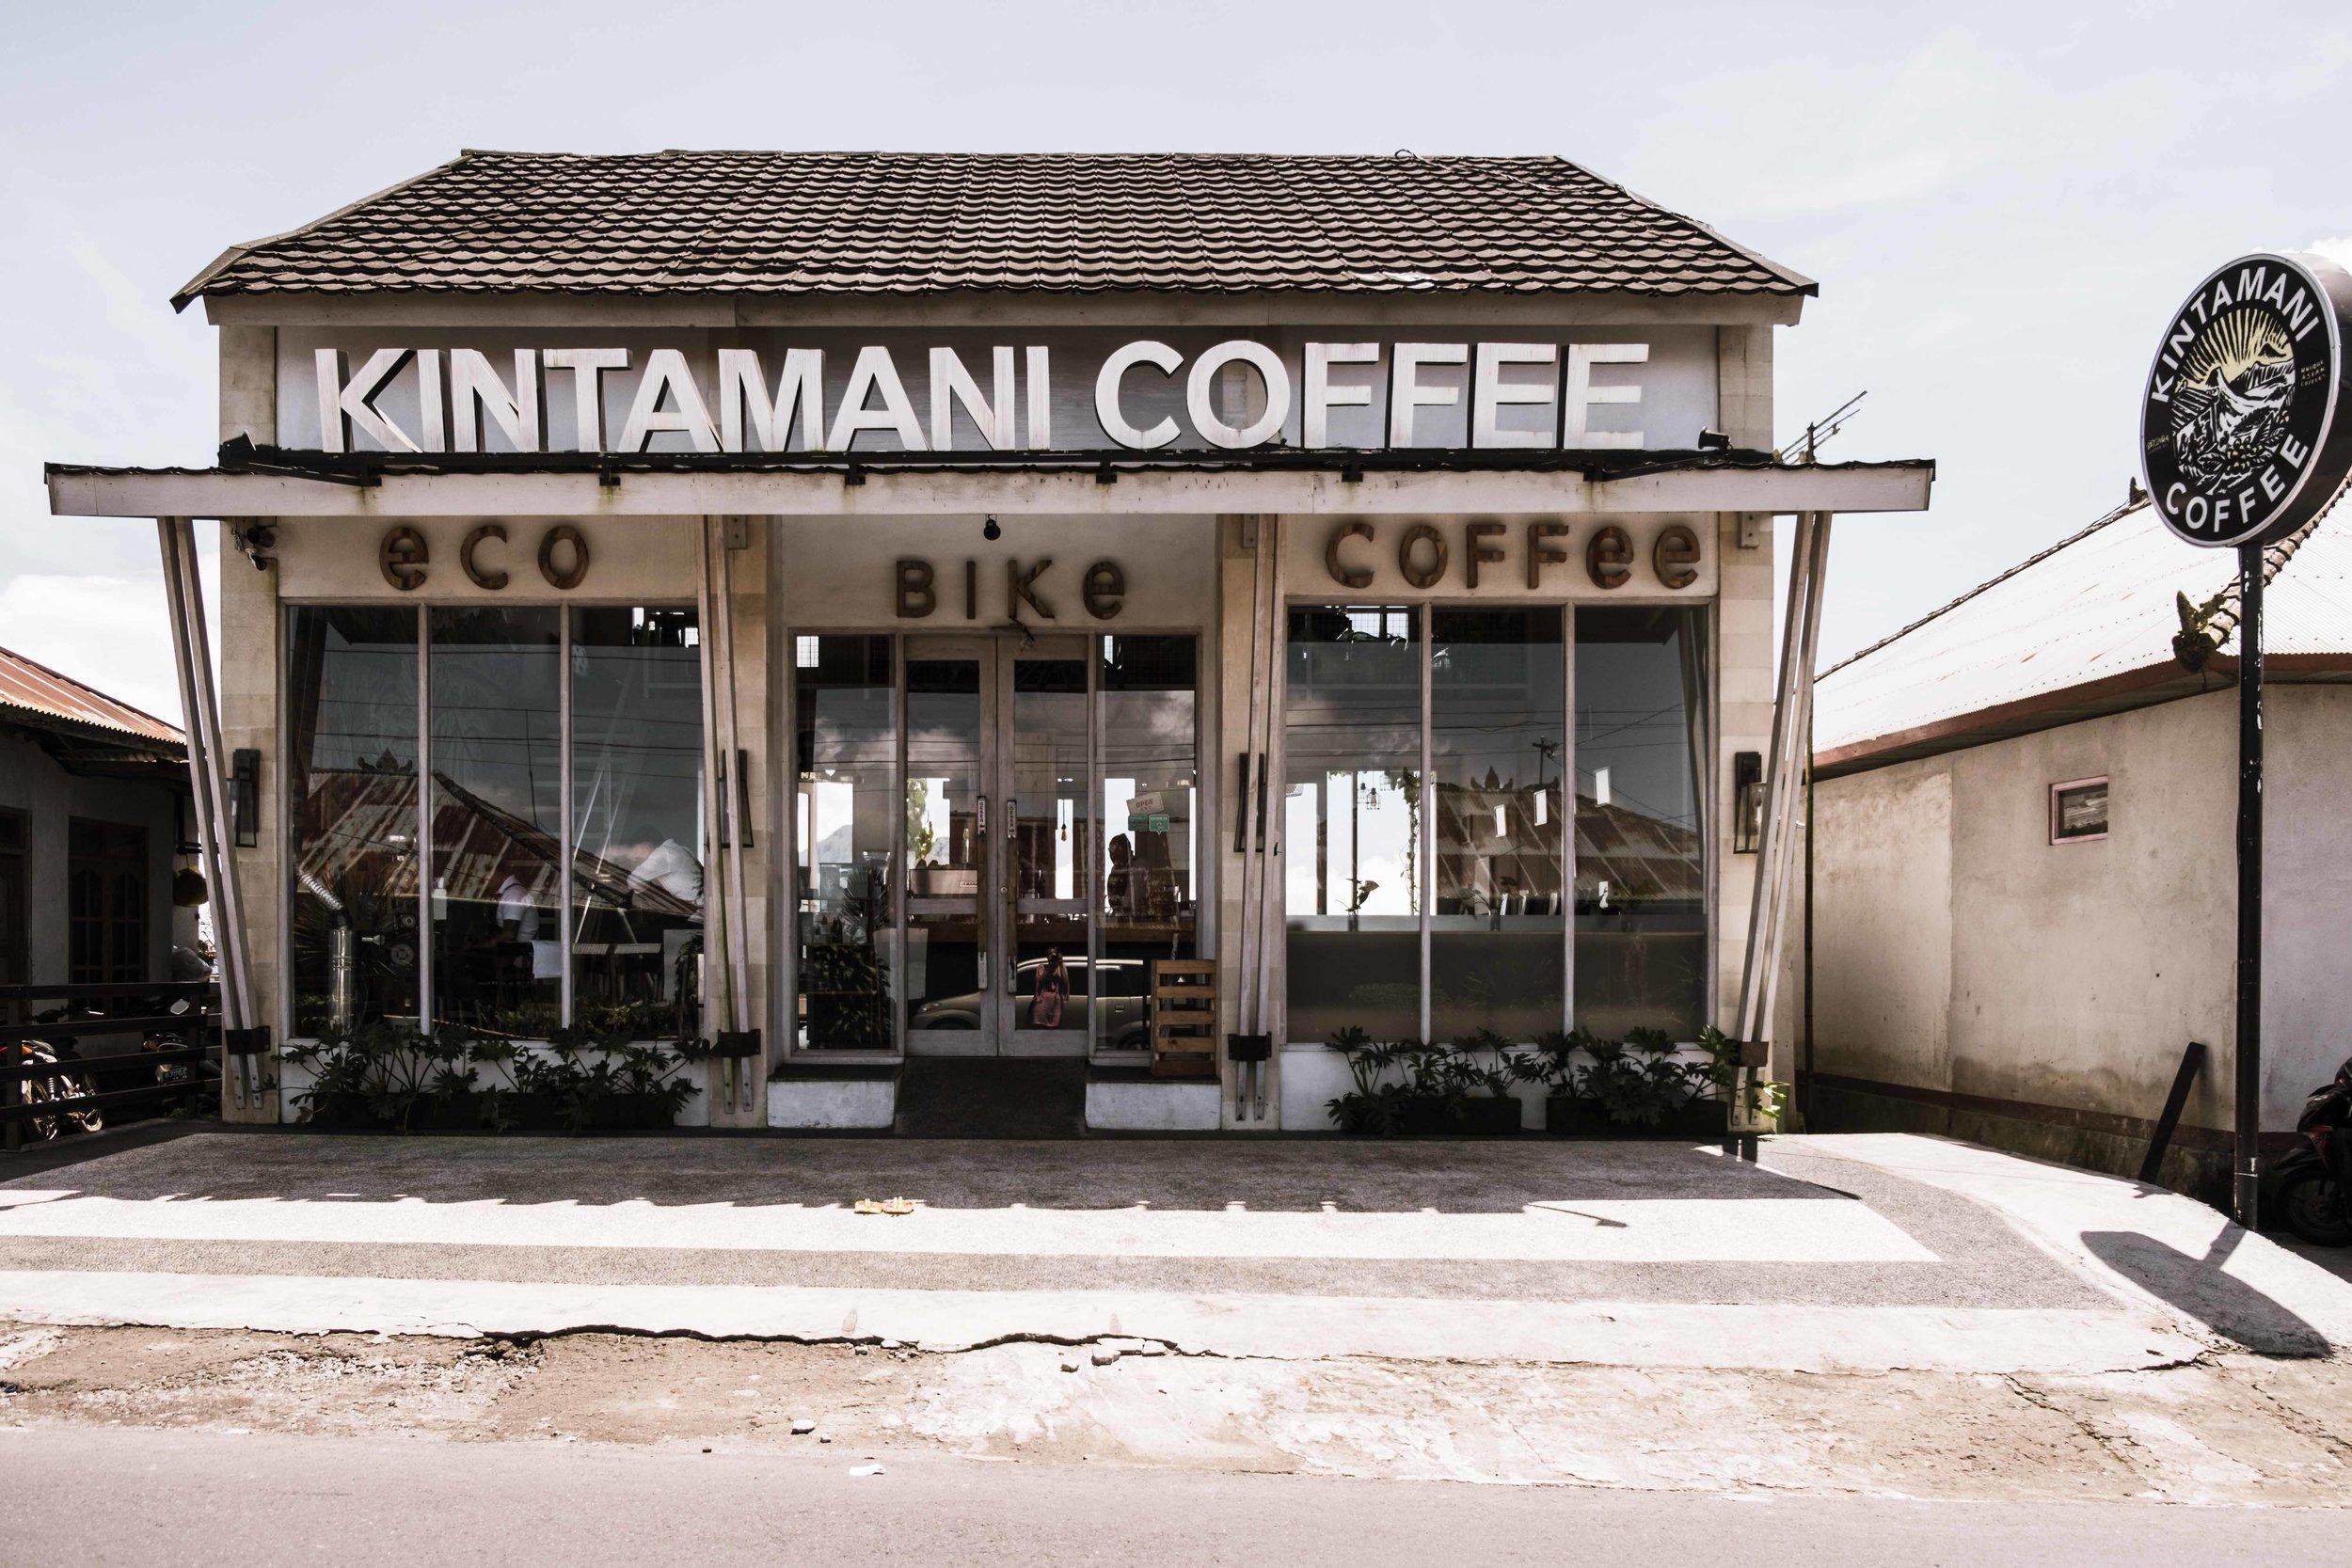 Kintamani Coffee Mount Batur